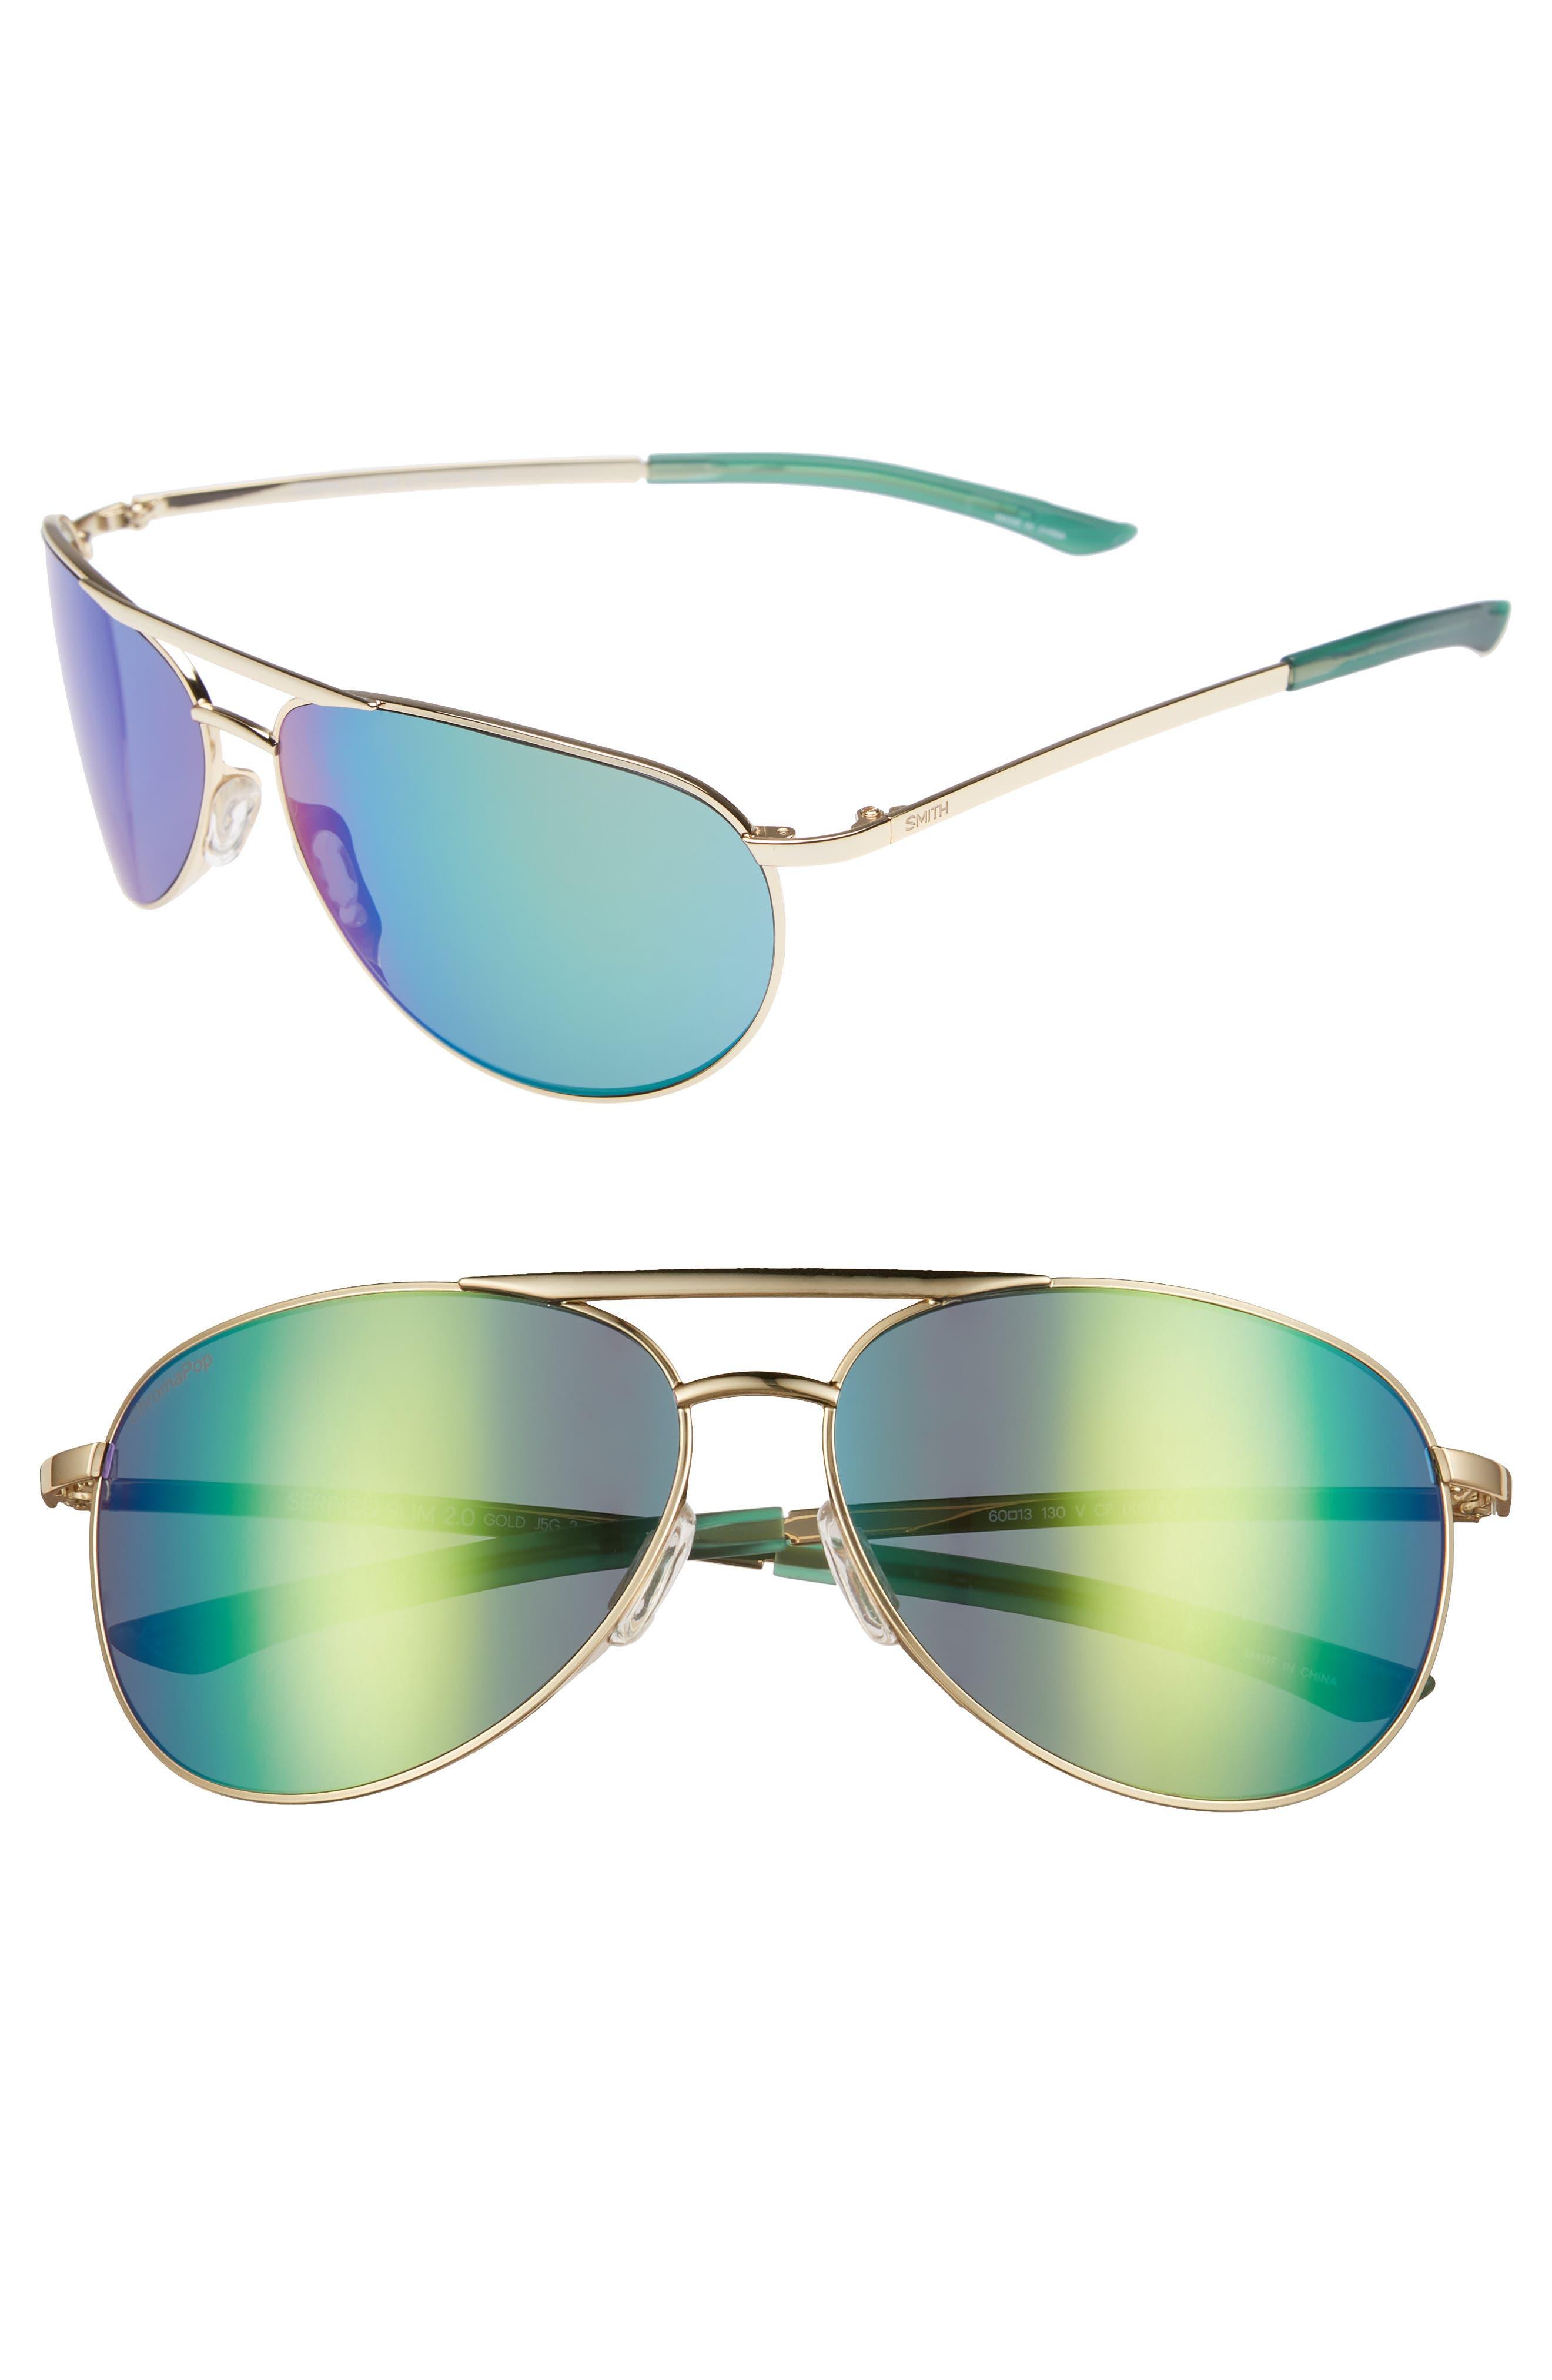 Serpico Slim 2.0 60mm ChromaPop Polarized Aviator Sunglasses,                         Main,                         color, Gold/ Green Mirror